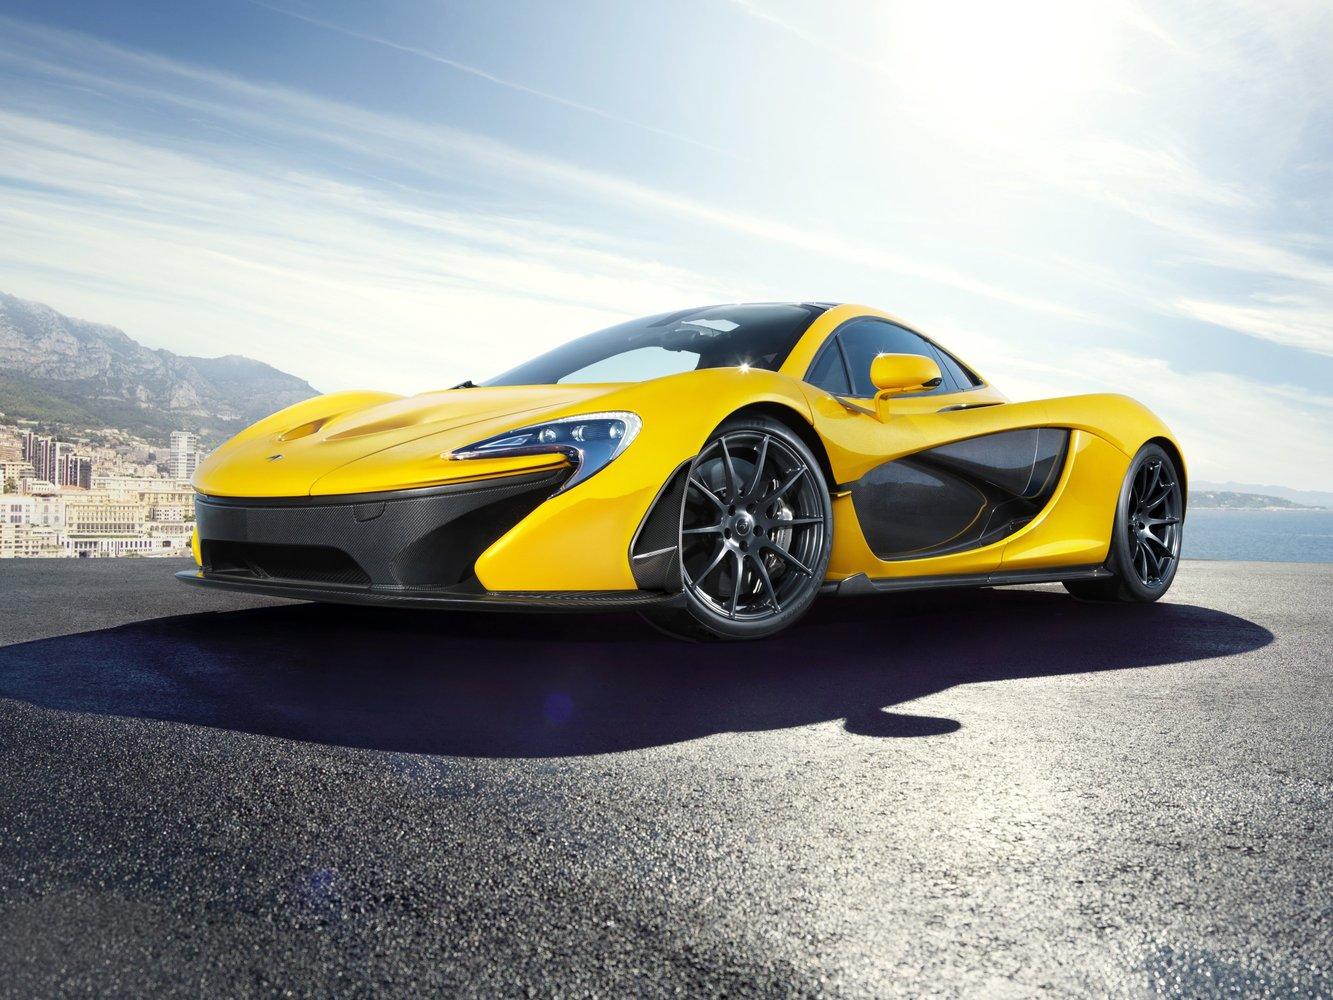 mclaren McLaren P1